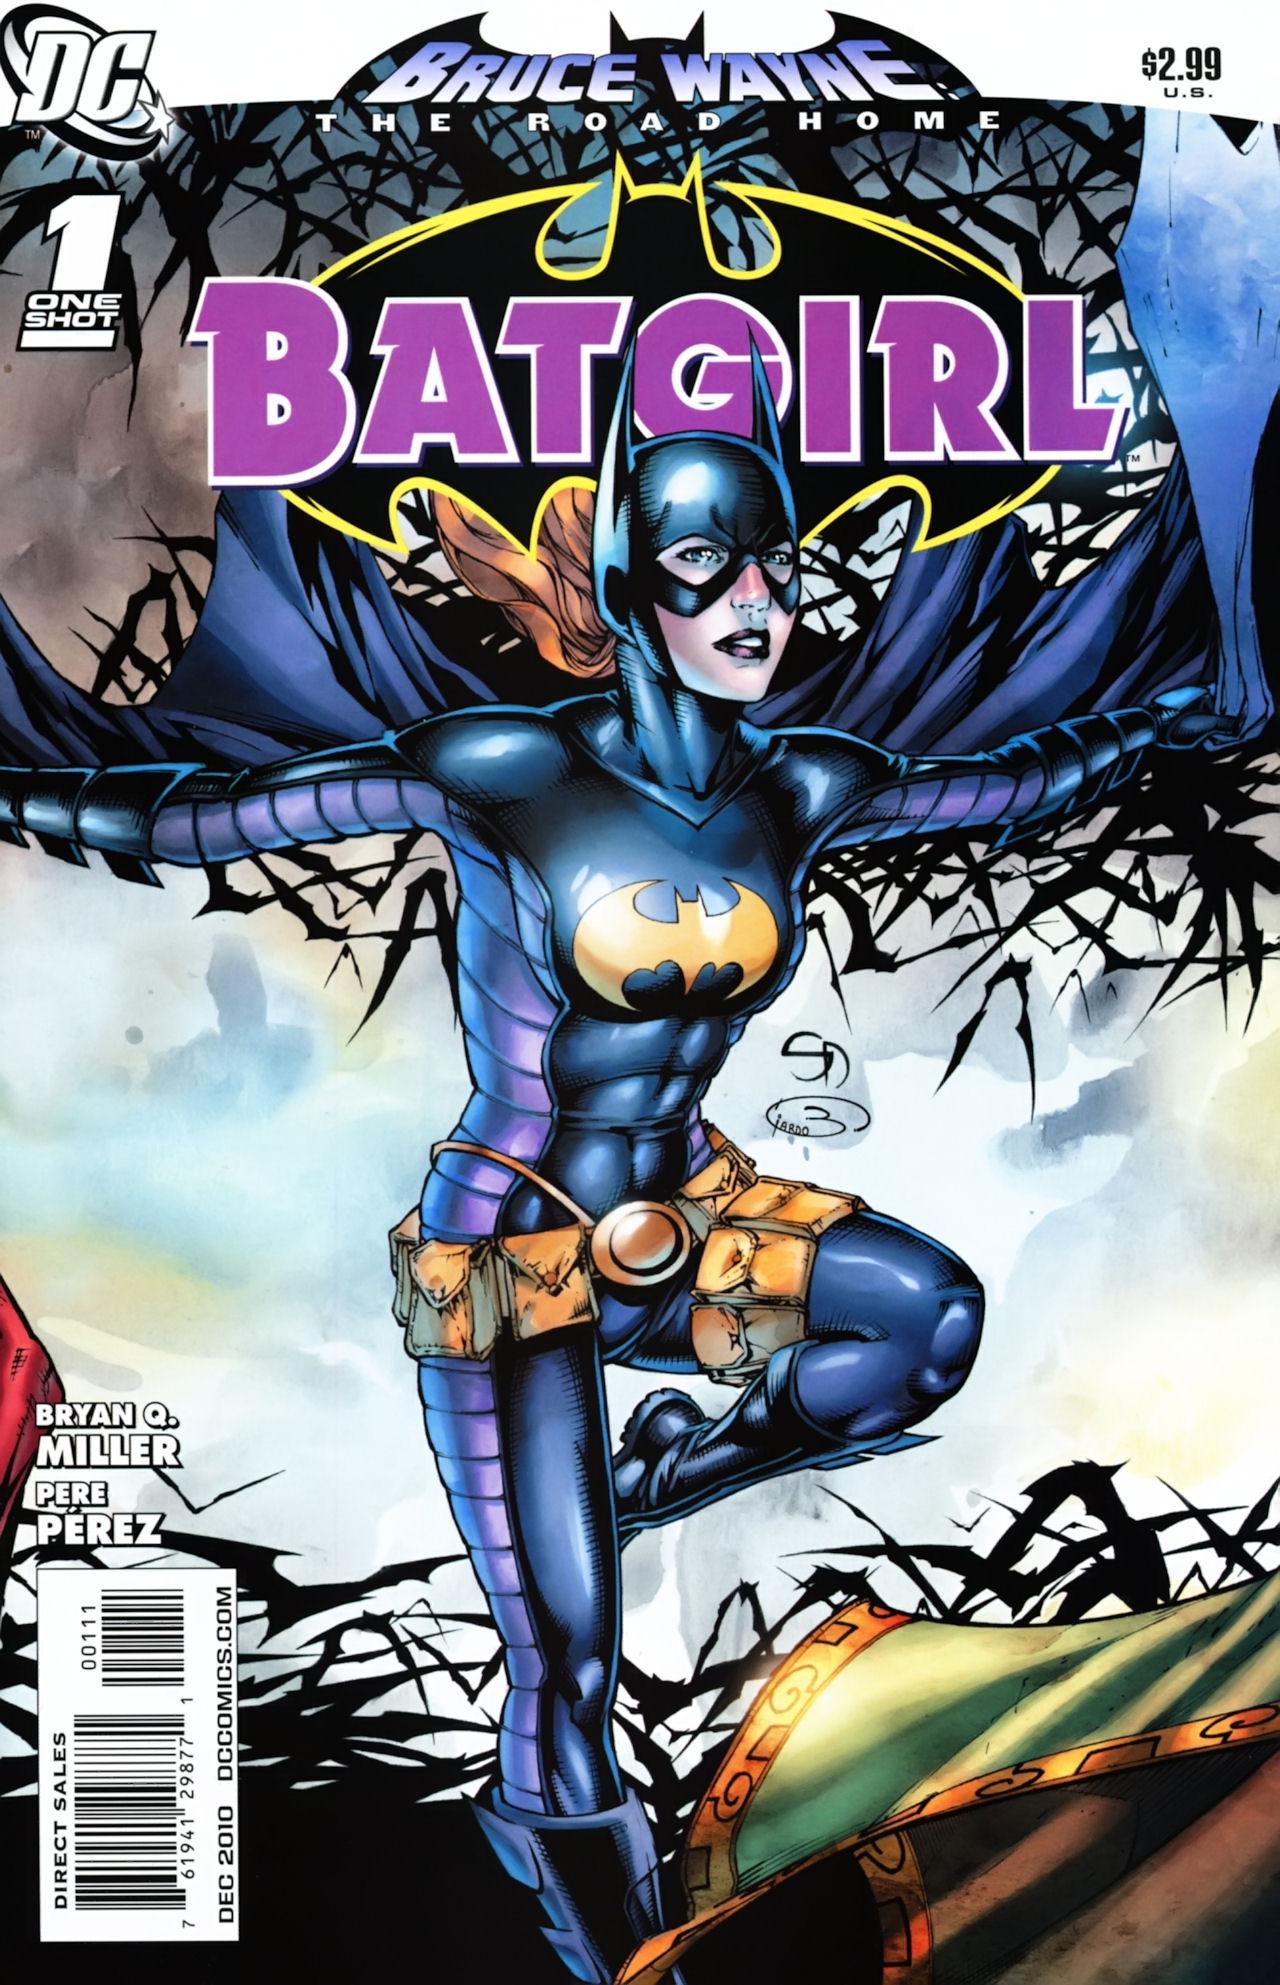 Batgirl Defeated Bruce_wayne-_the_road_home-_ ...